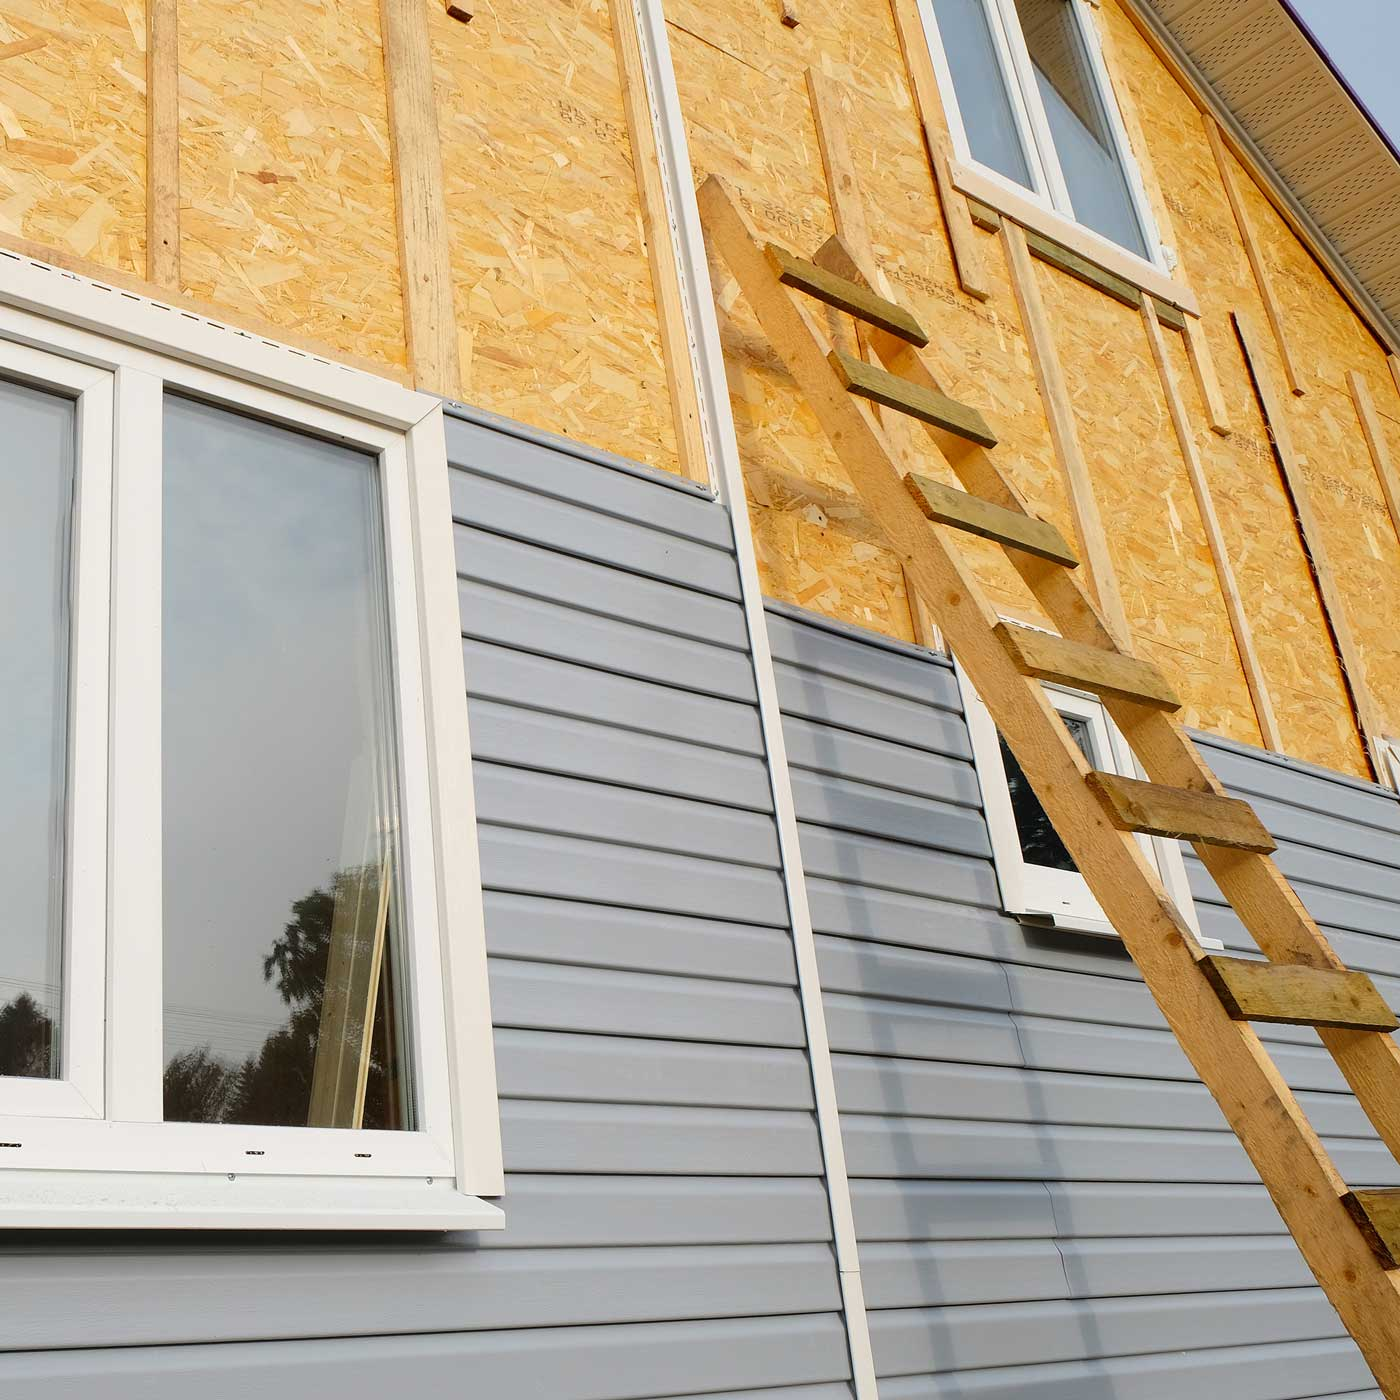 siding installation, quality homes, rochester, ny